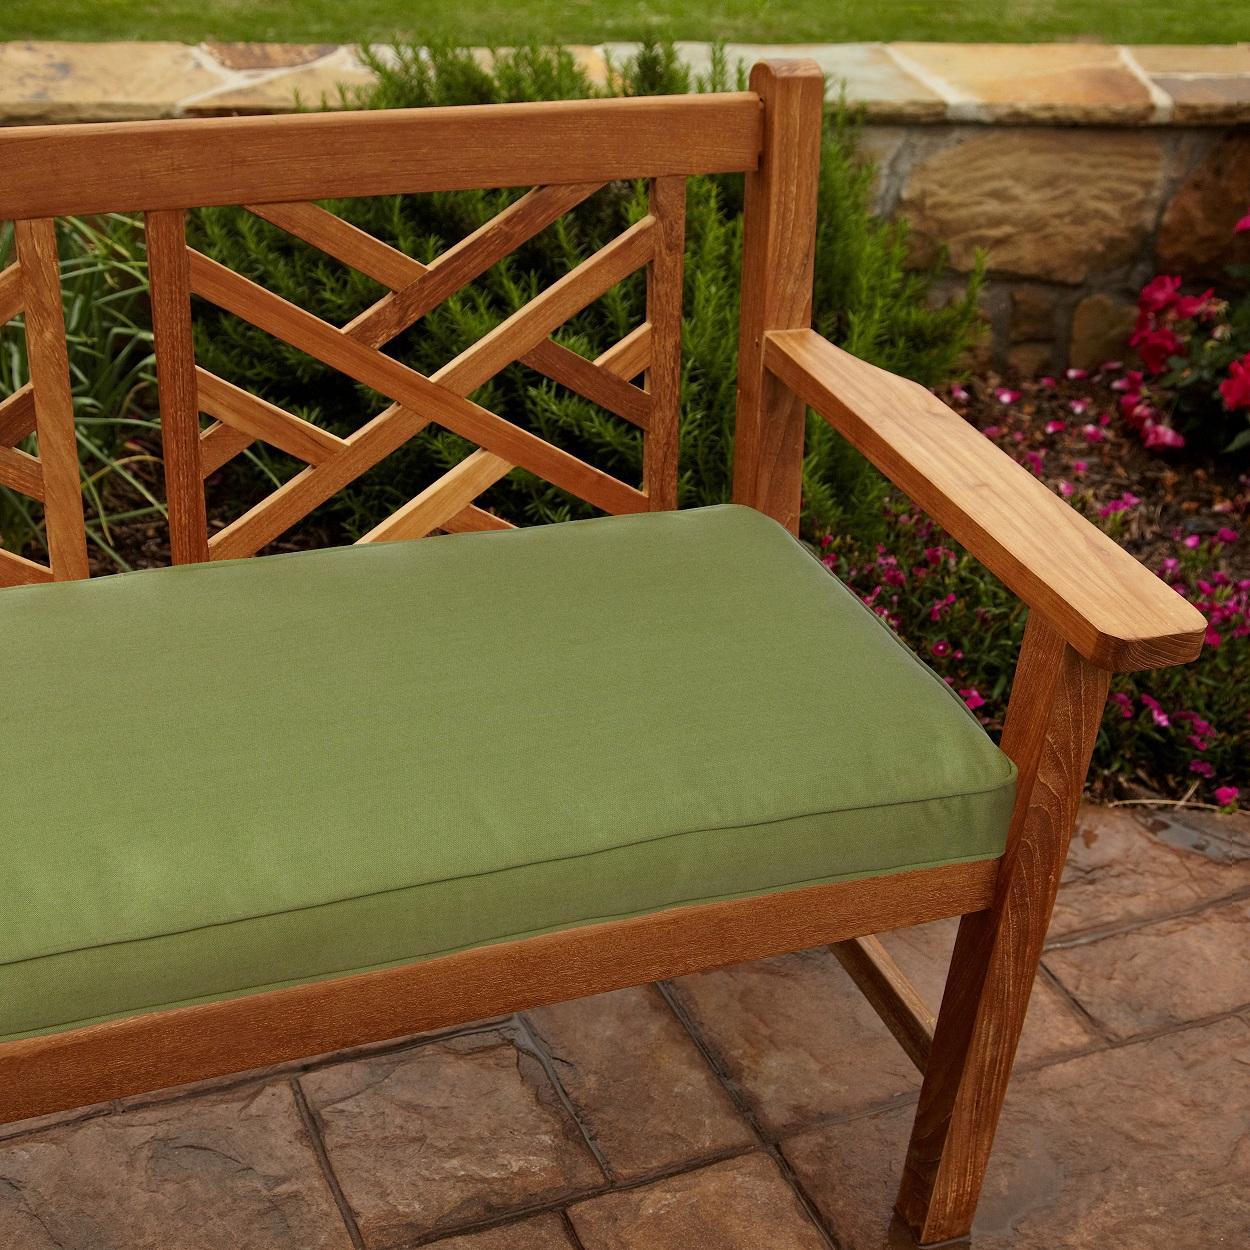 Amazon Mozaic Indoor Outdoor Corded Bench Cushion